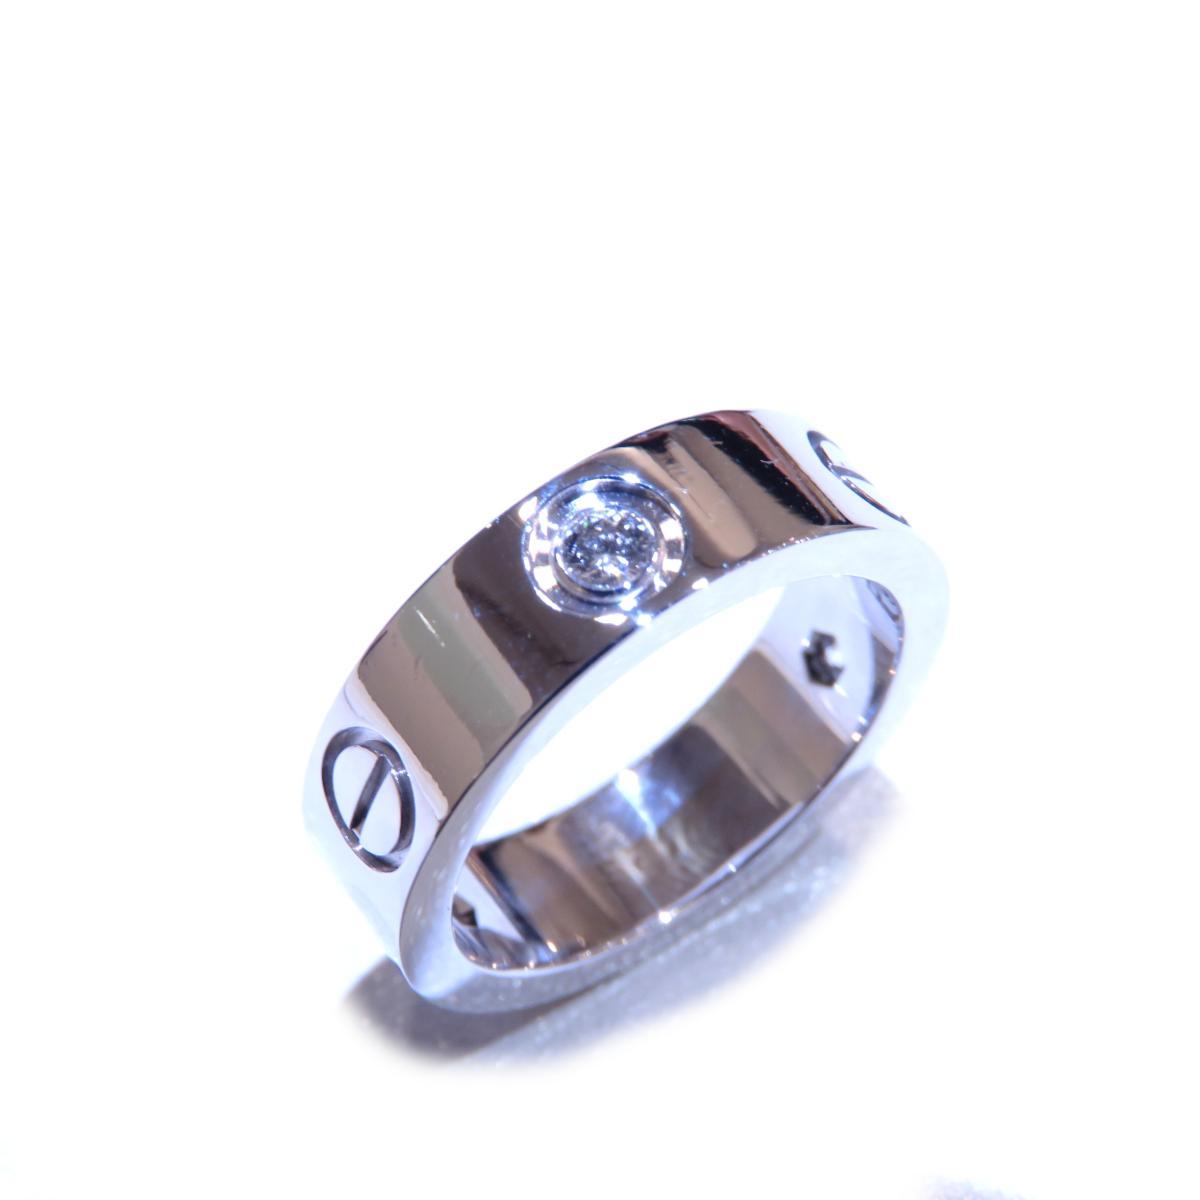 Cartier(カルティエ)/ラブリング ハーフダイヤ 指輪/リング//K18WG(750)ホワイトゴールド×ダイヤモンド/【ランクA】/#51/11号【中古】